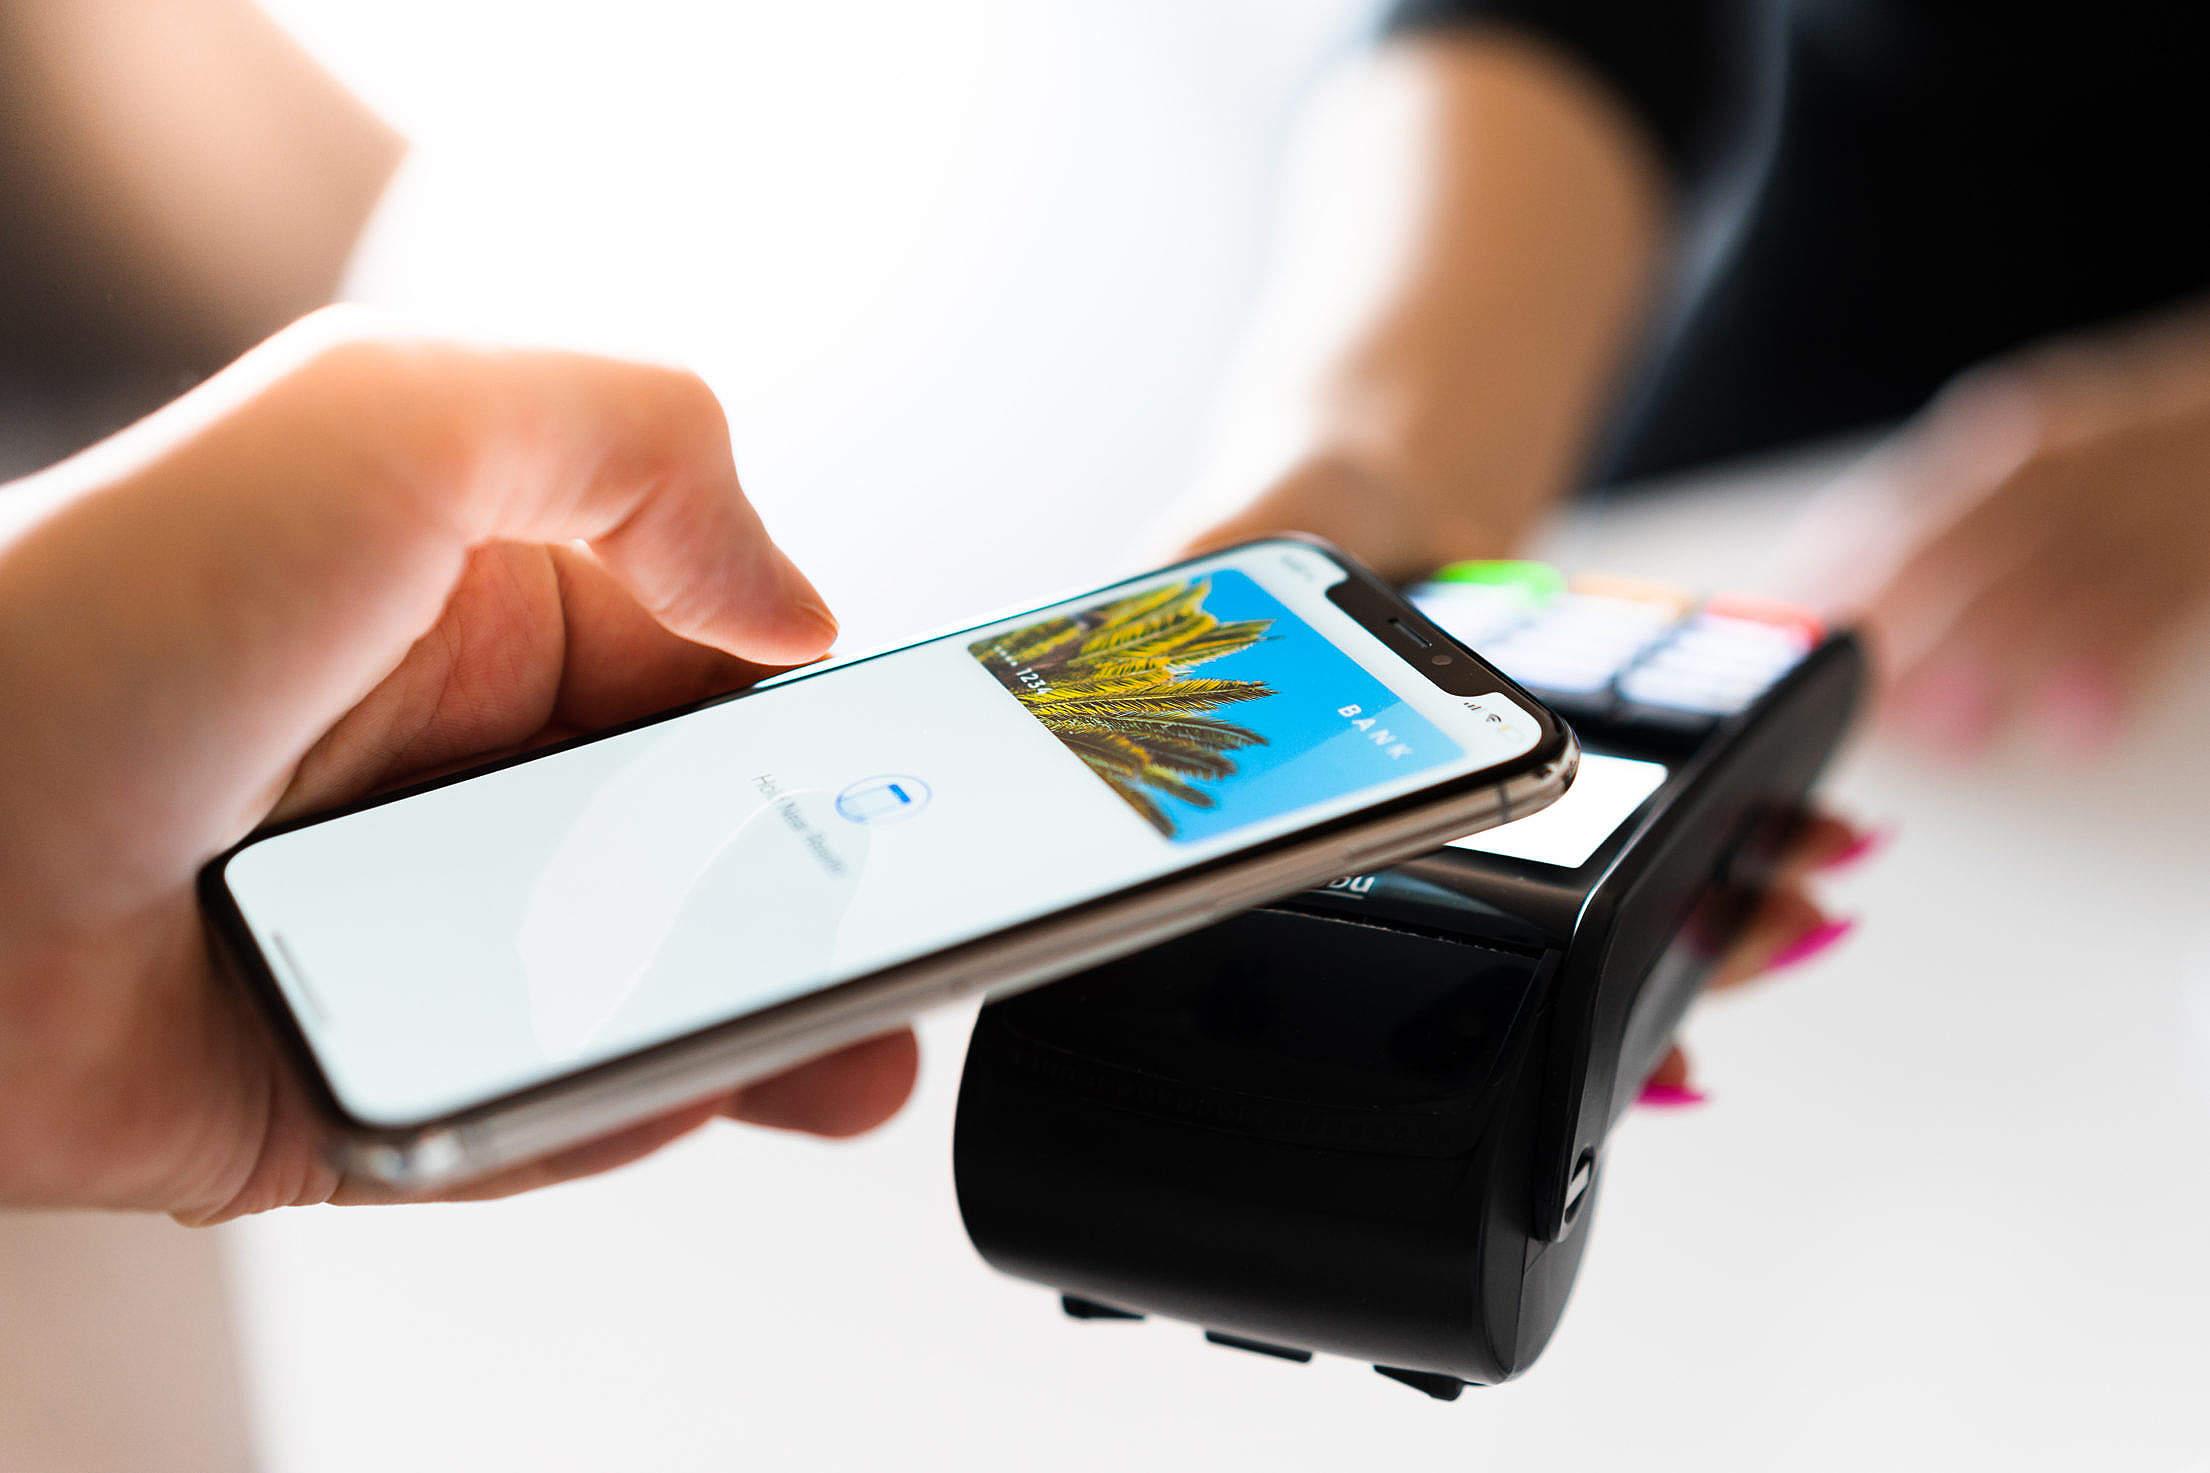 NFC功能大解放!iOS 13將可讓iPhone用戶掃描身分證及快速支付